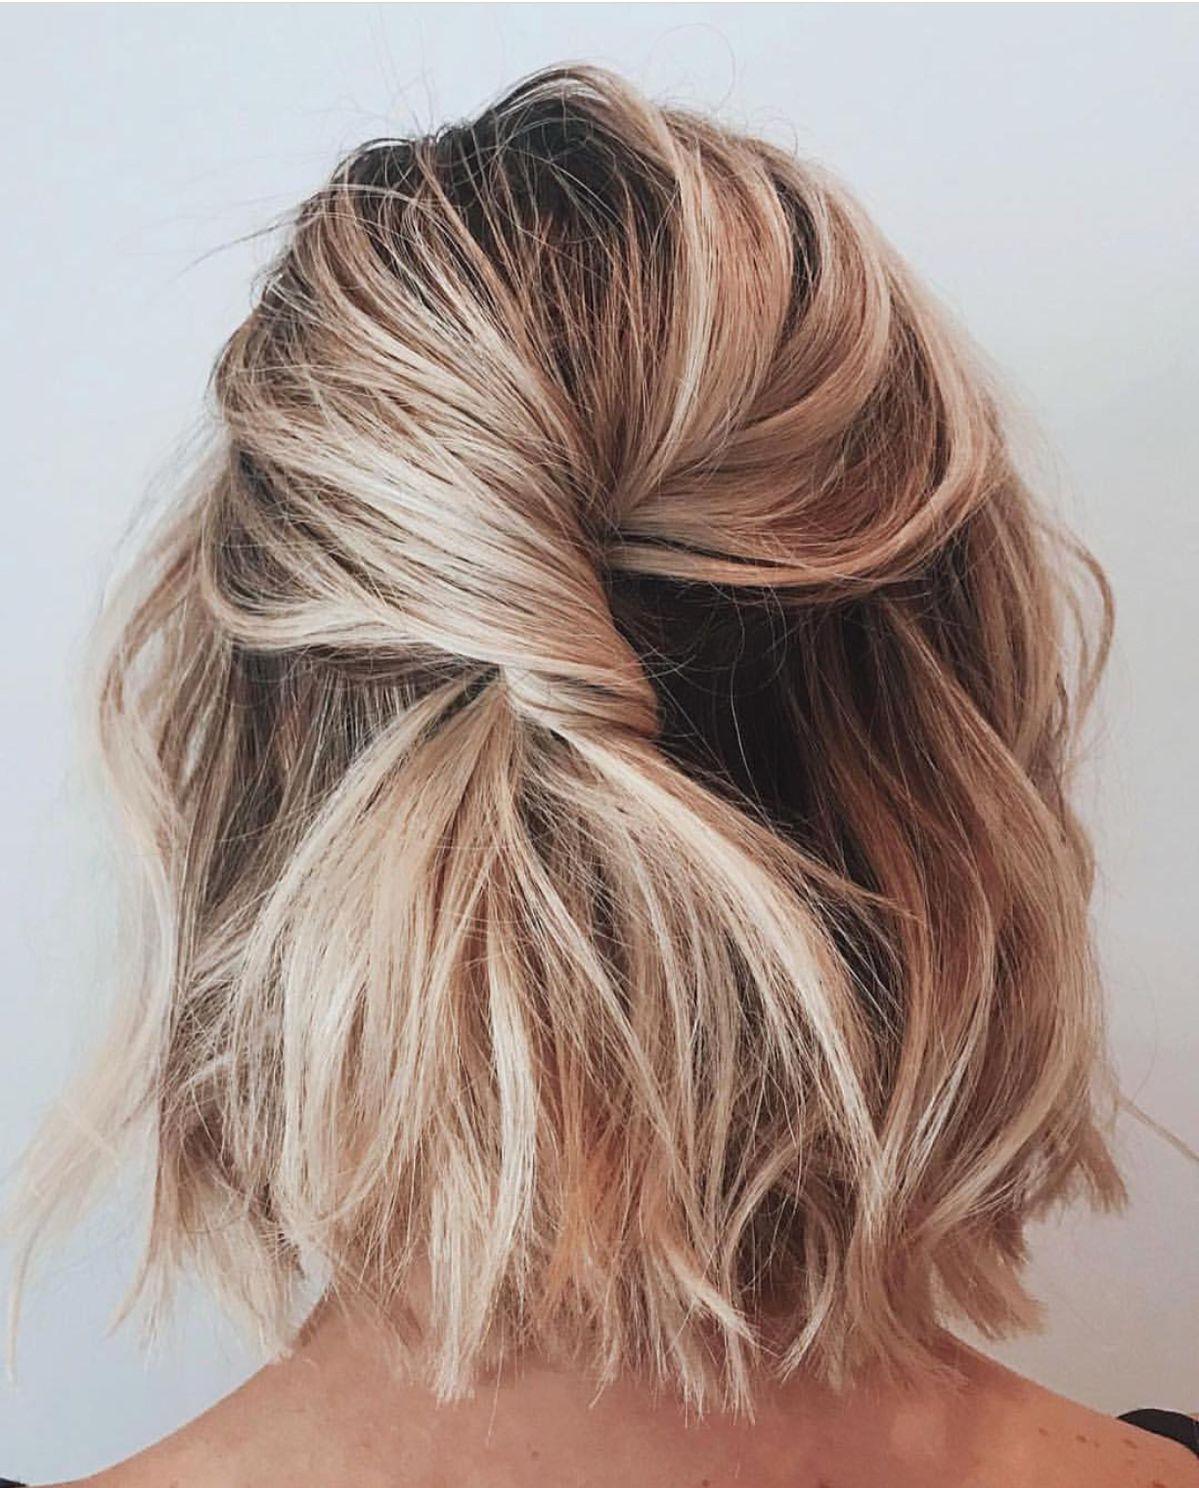 HAIR STYLES 2019-04-01 14:12:01